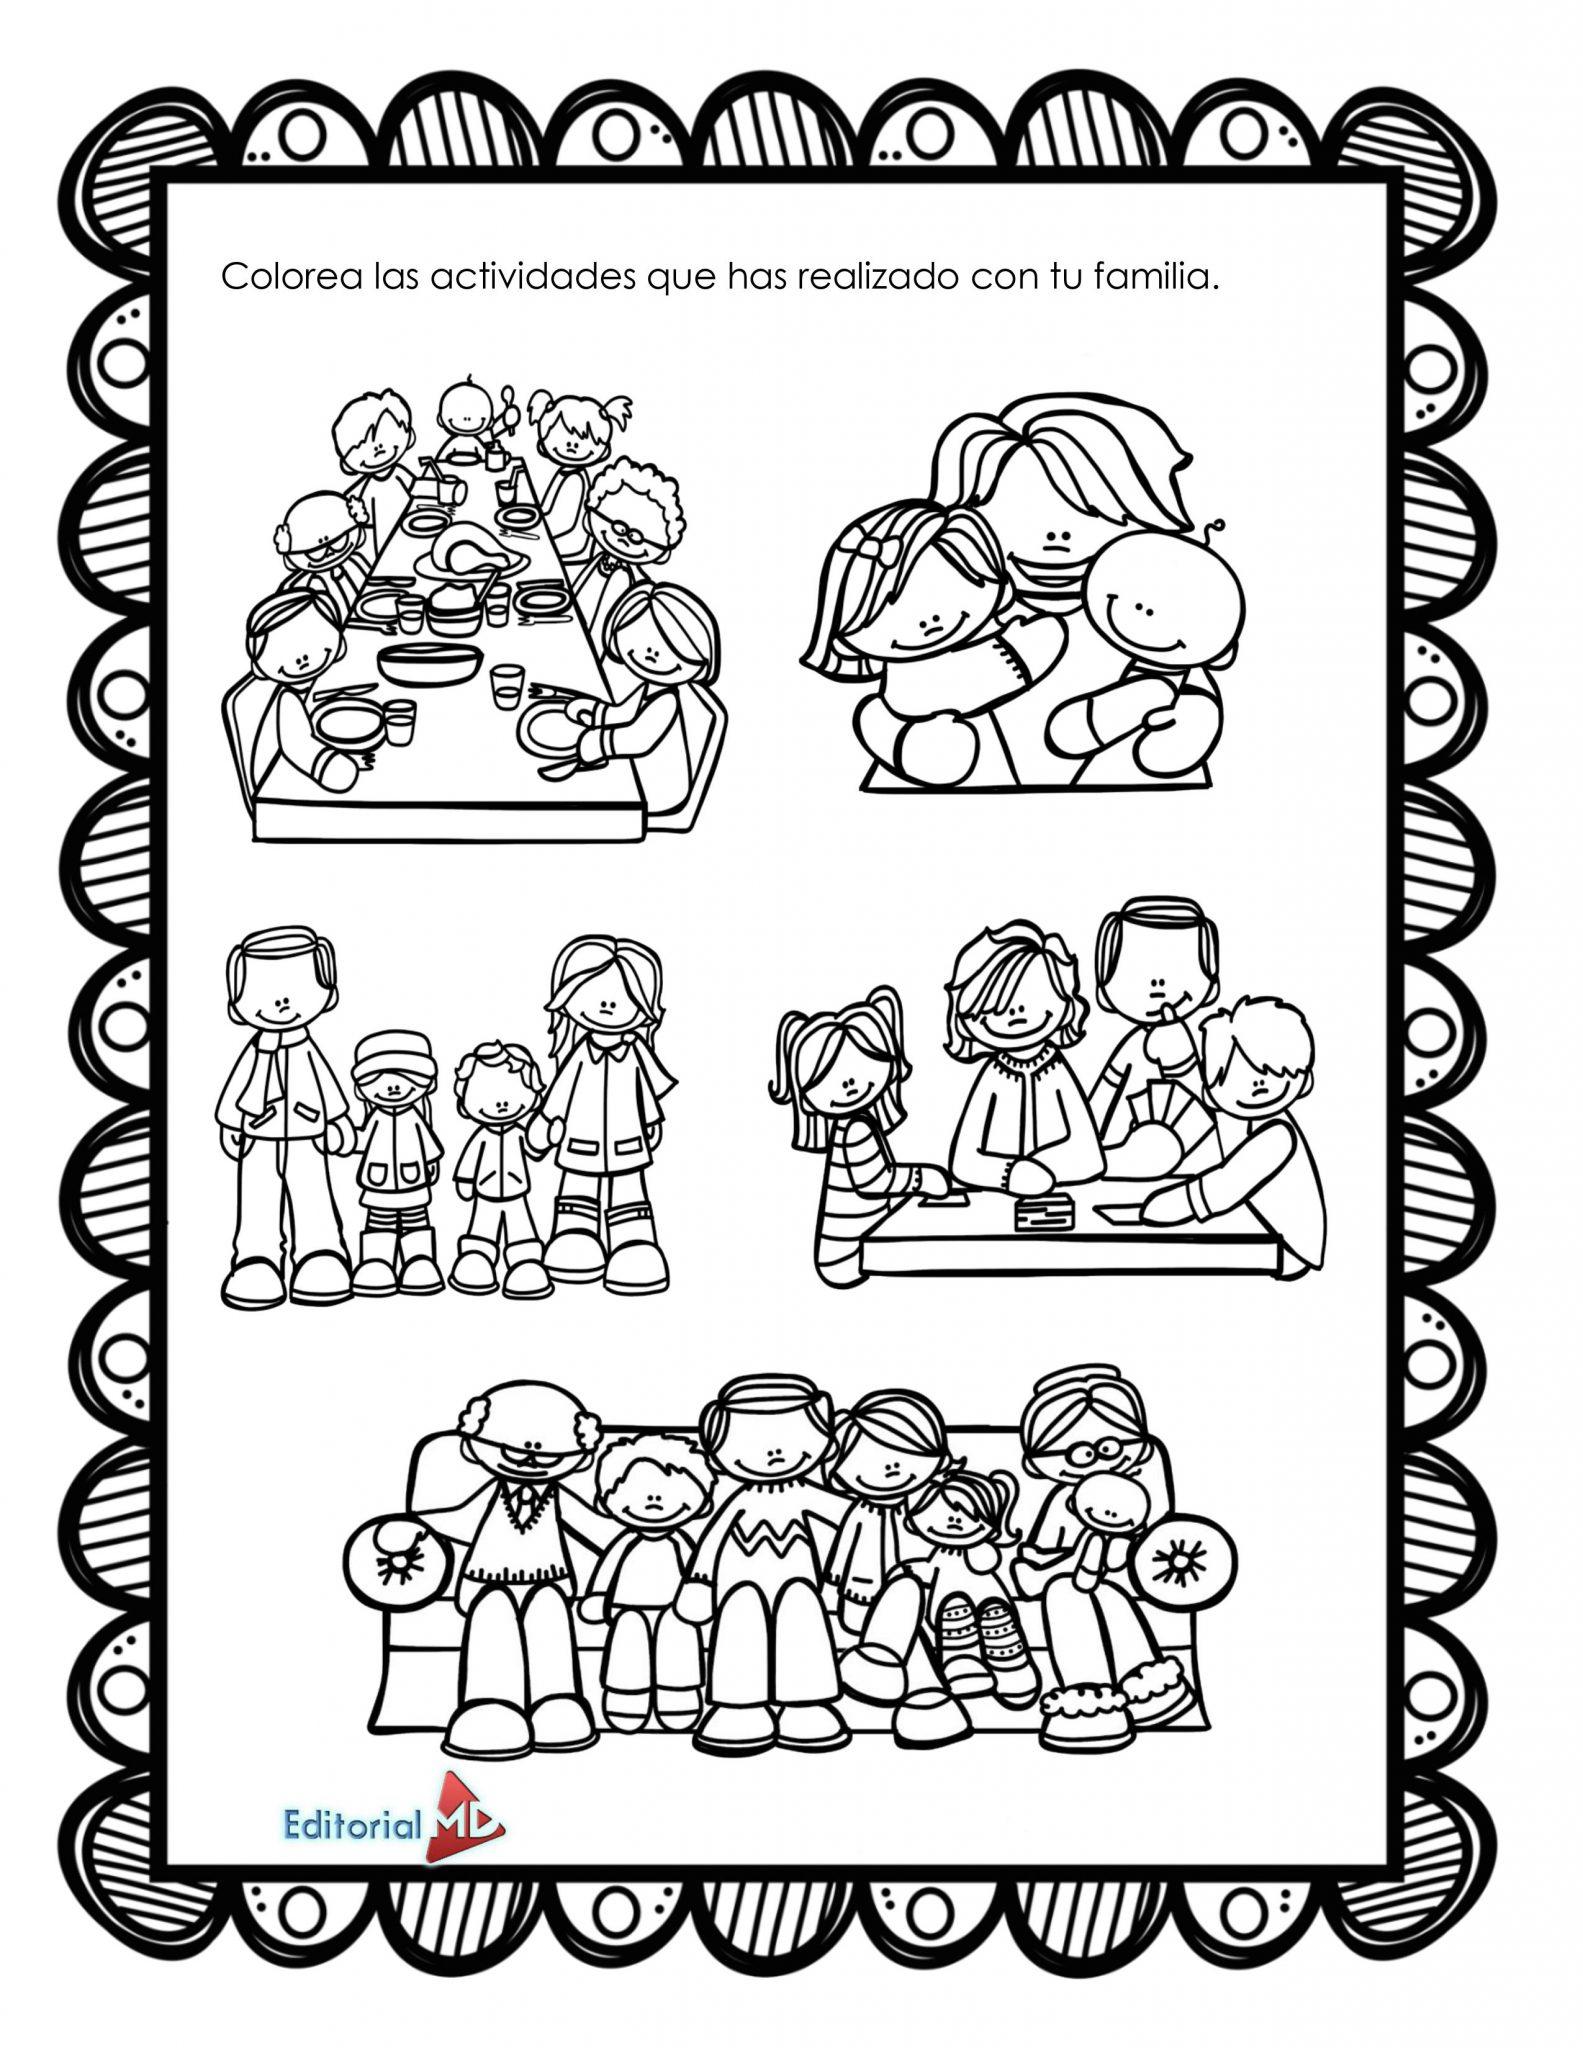 Ejemplo Material de apoyo semana 23 preescolar 02